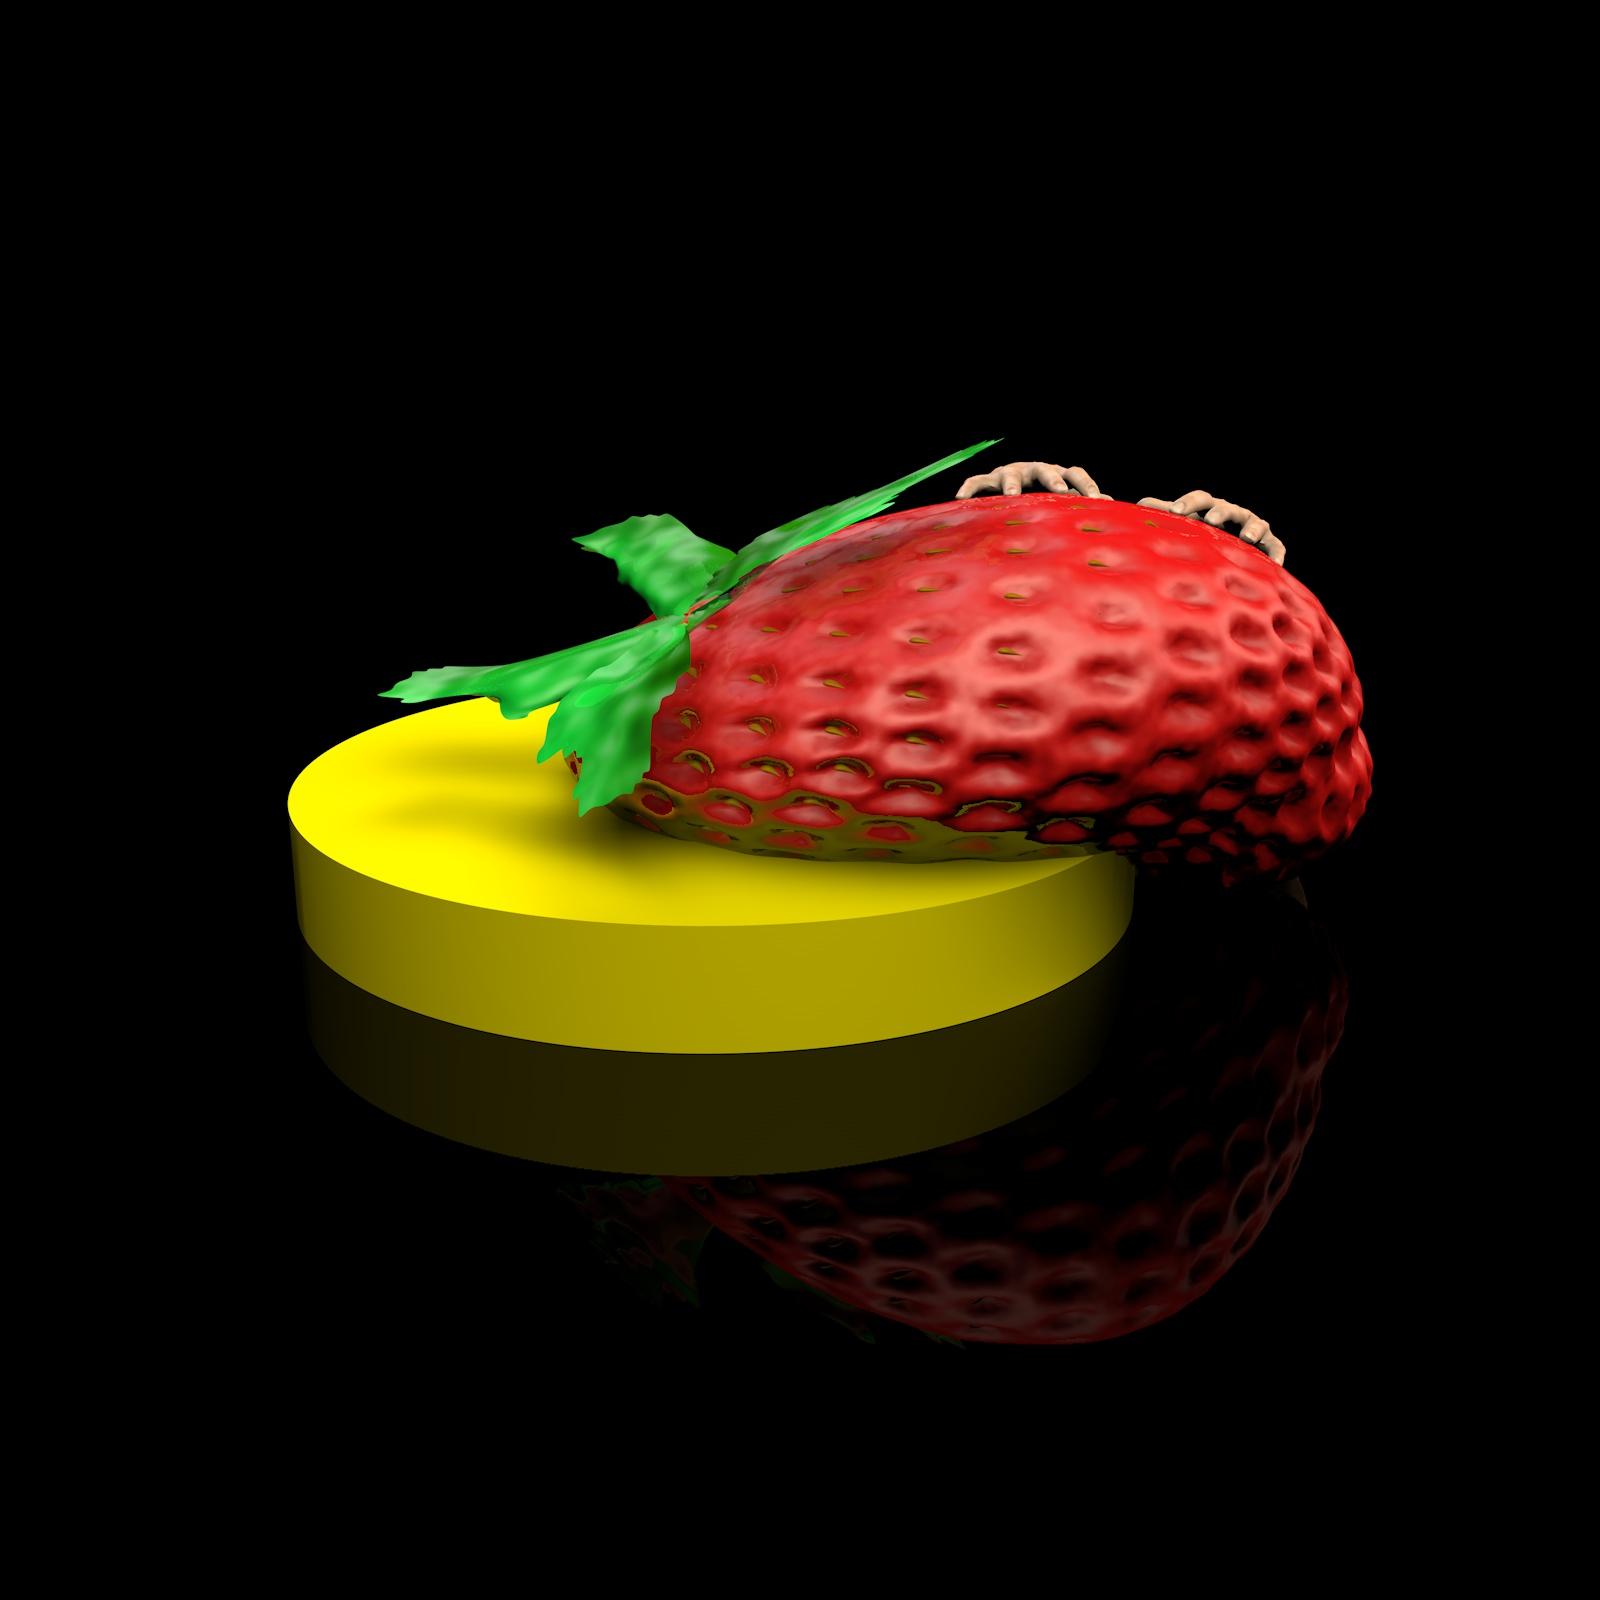 strawberryyellow.jpg